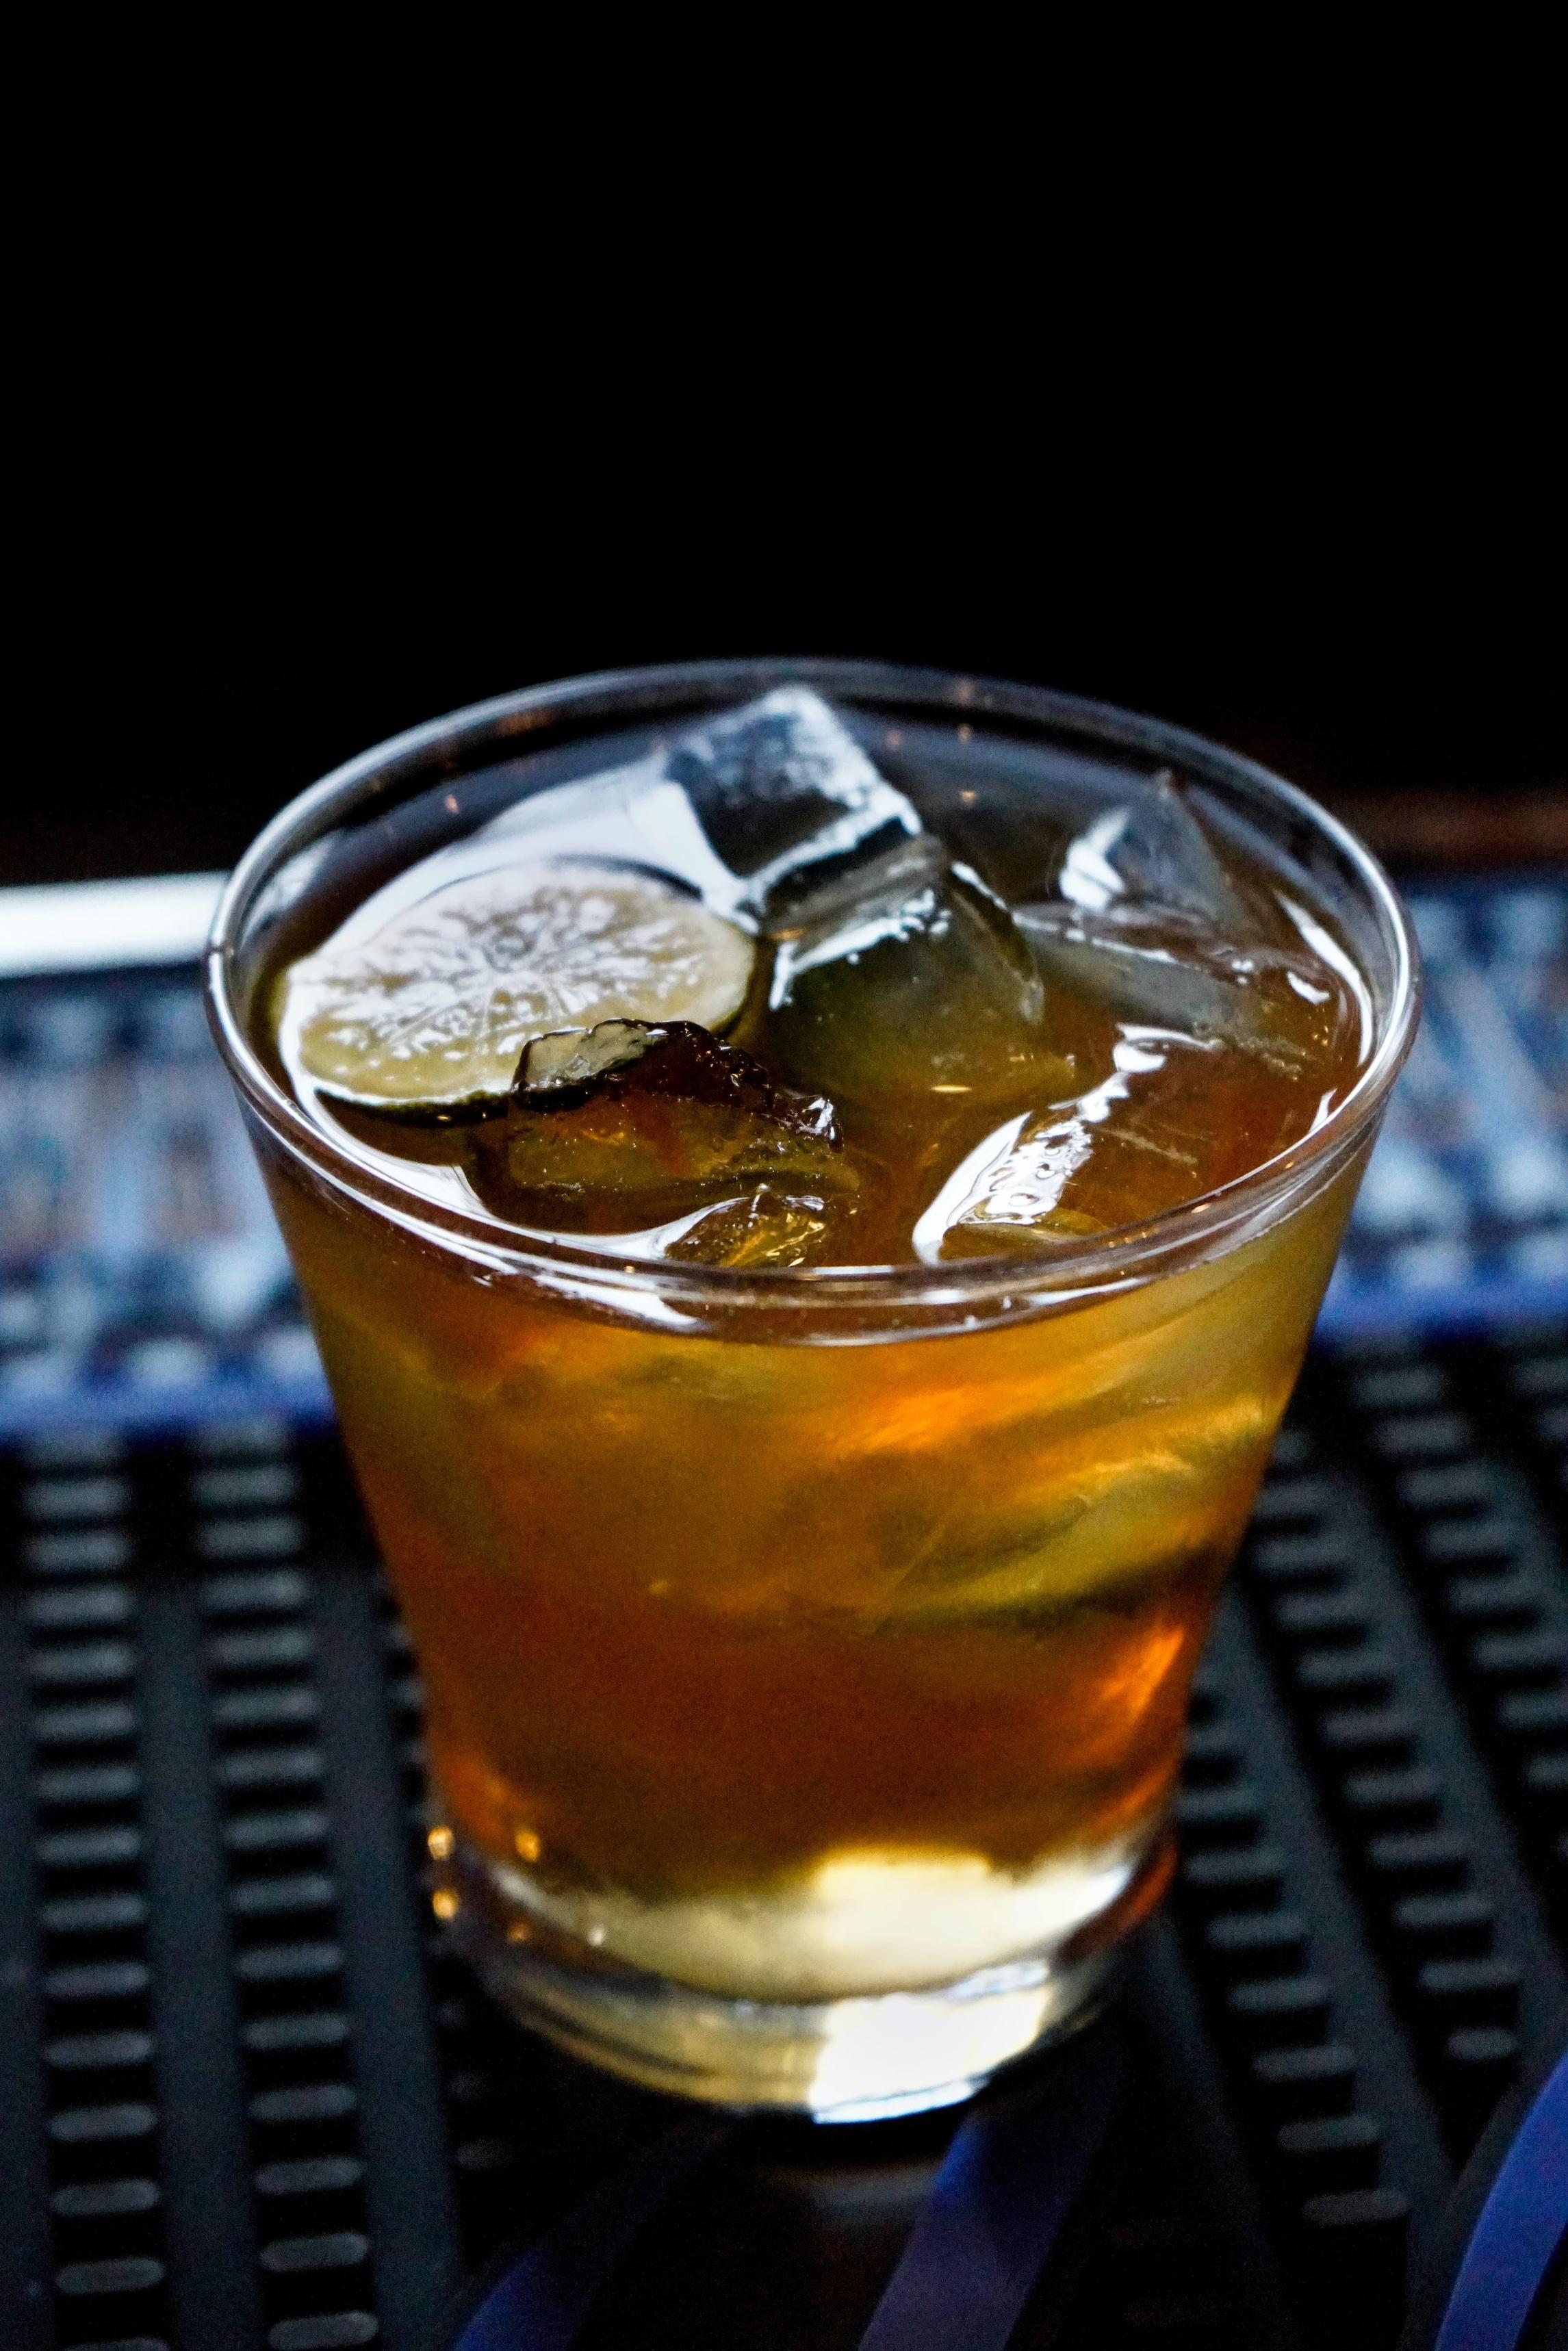 The Murphy Twist, made with Larceny bourbon